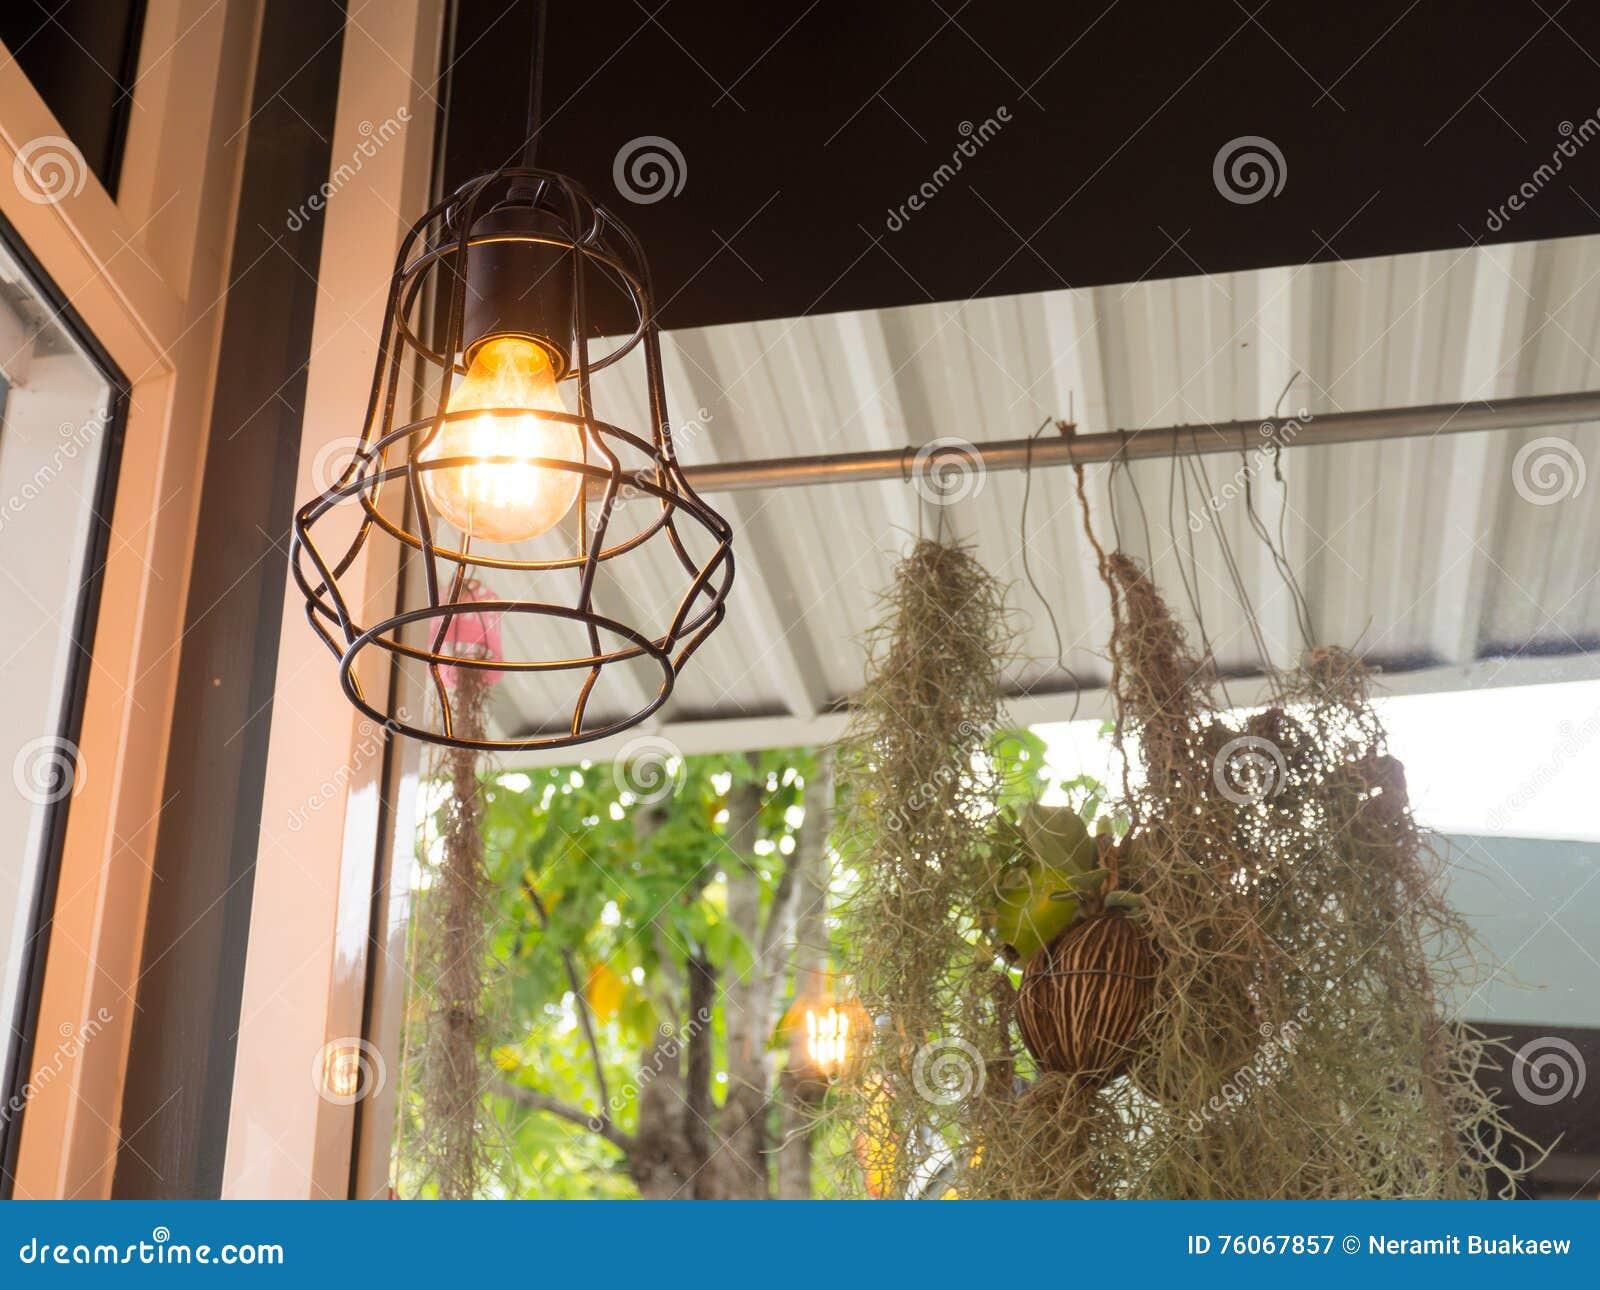 Moderne Lampen 57 : Edisons glühlampe und lampe in der modernen art warme